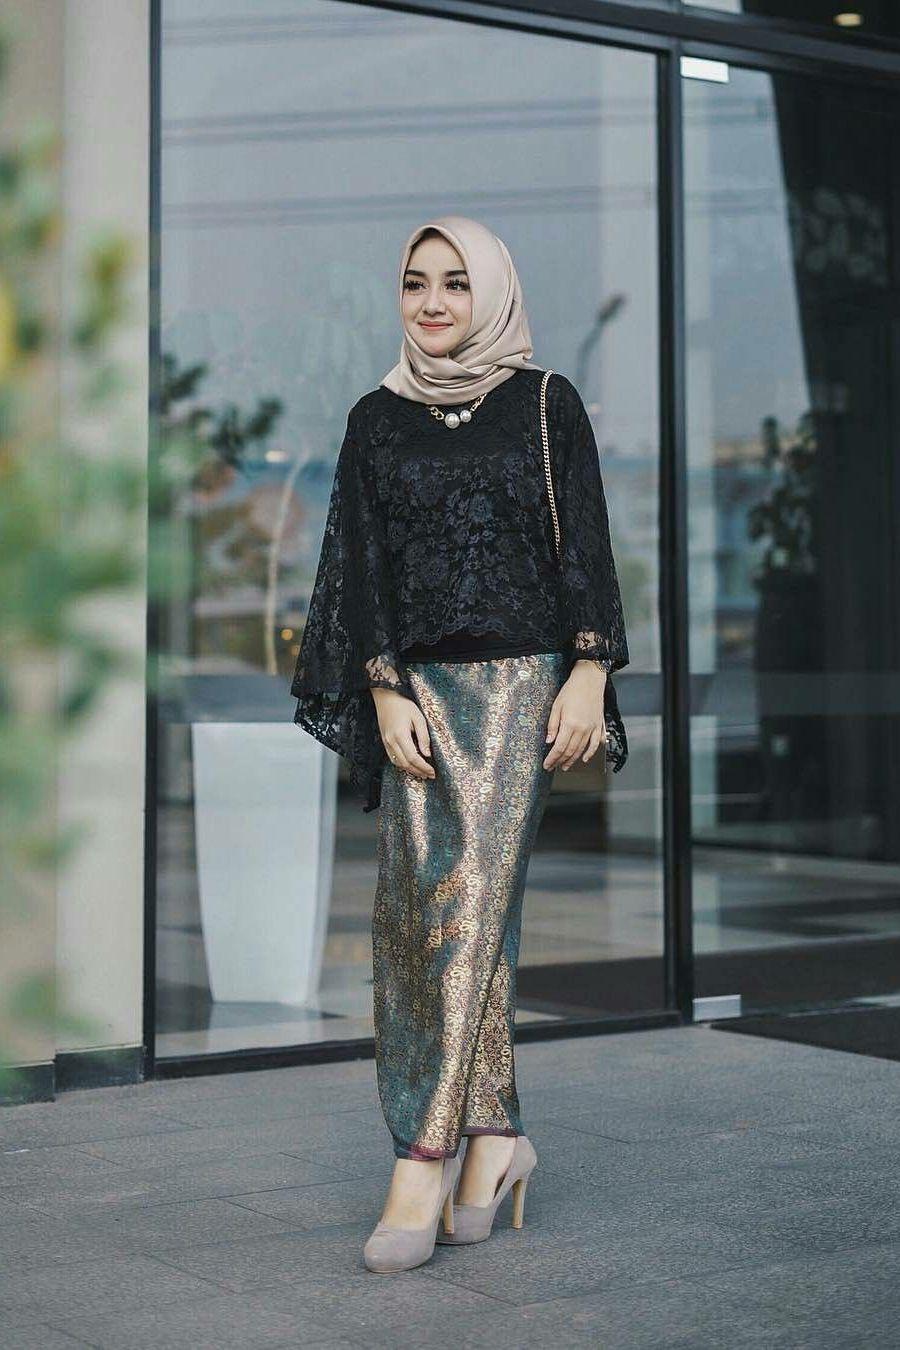 Tutorial Hijab Dengan Baju Brokat  Kursus hijab, Wanita, Model